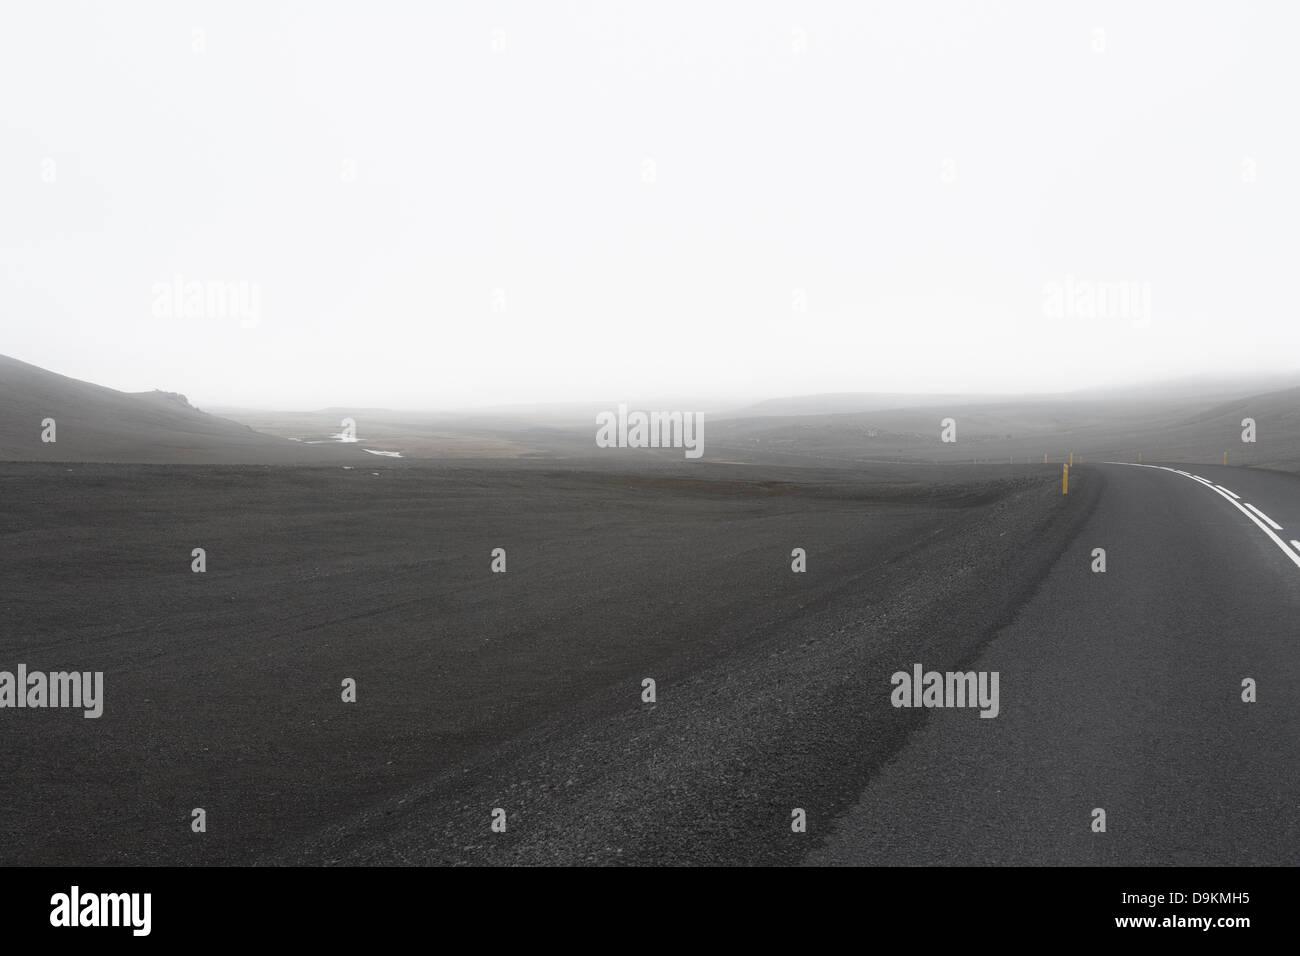 Grey Road dans paysage vide Photo Stock